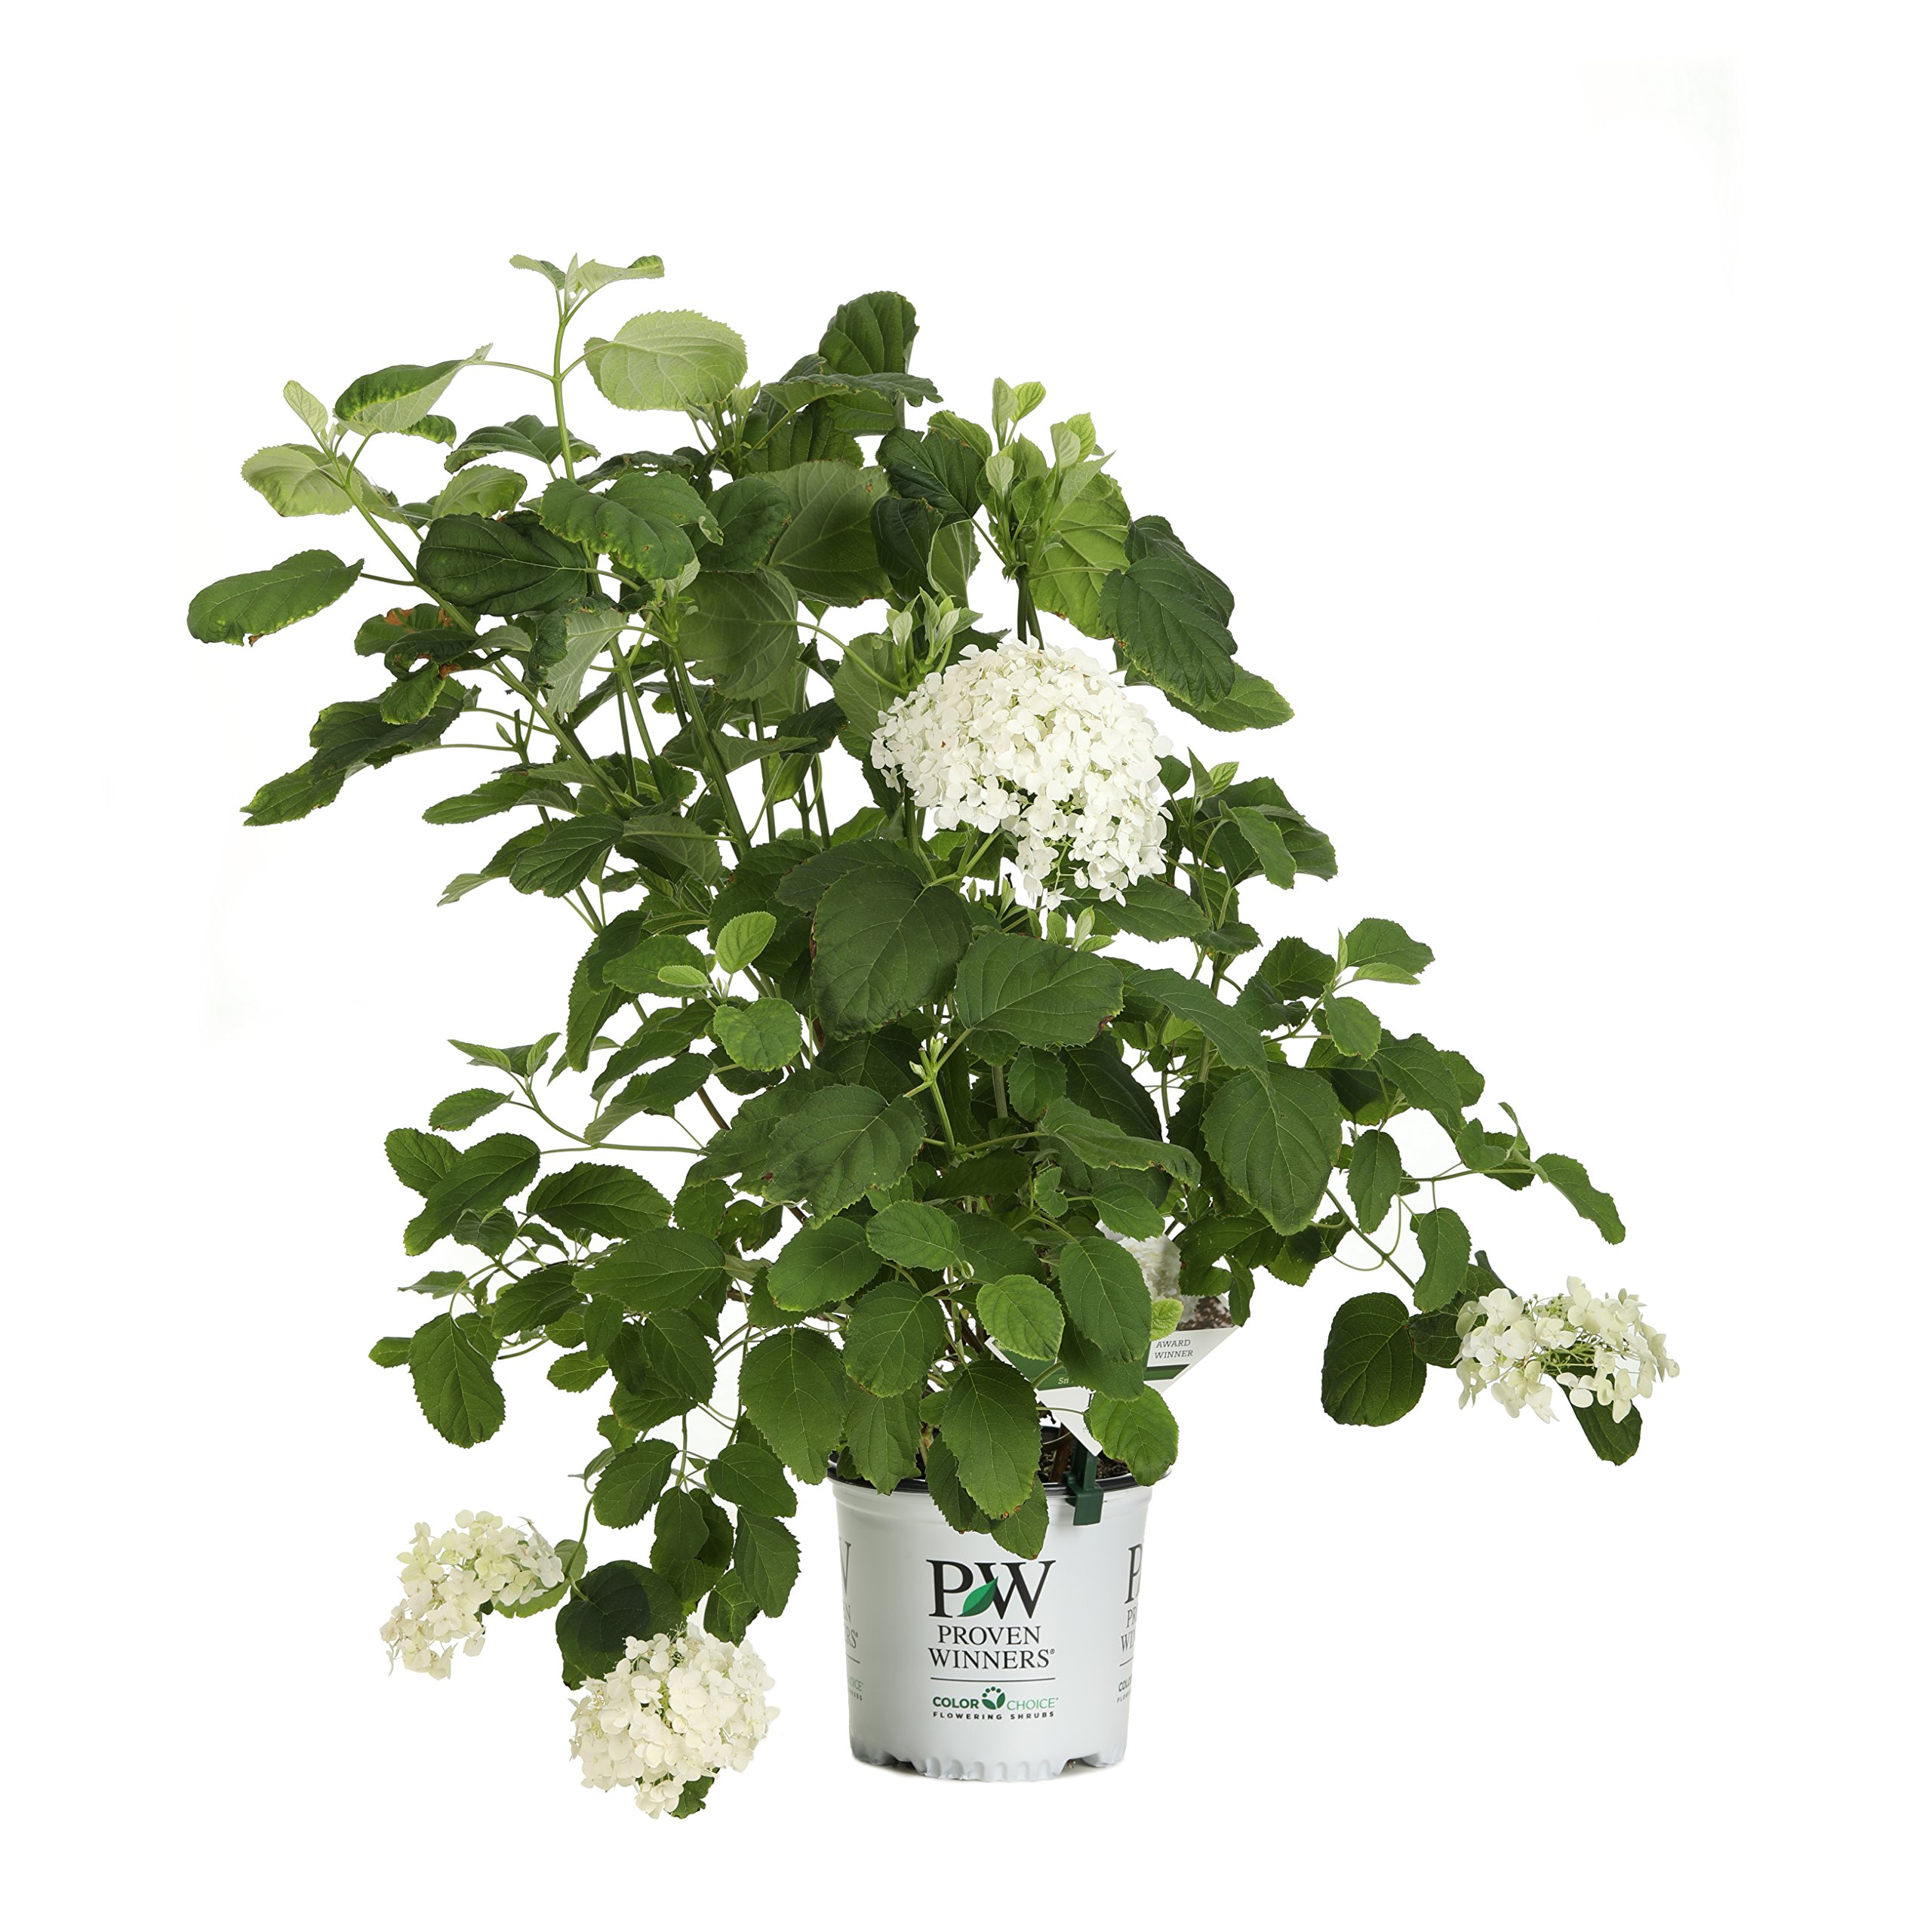 Incrediball Smooth Hydrangea, Live Shrub, Green to White Flowers, 1 Gallon